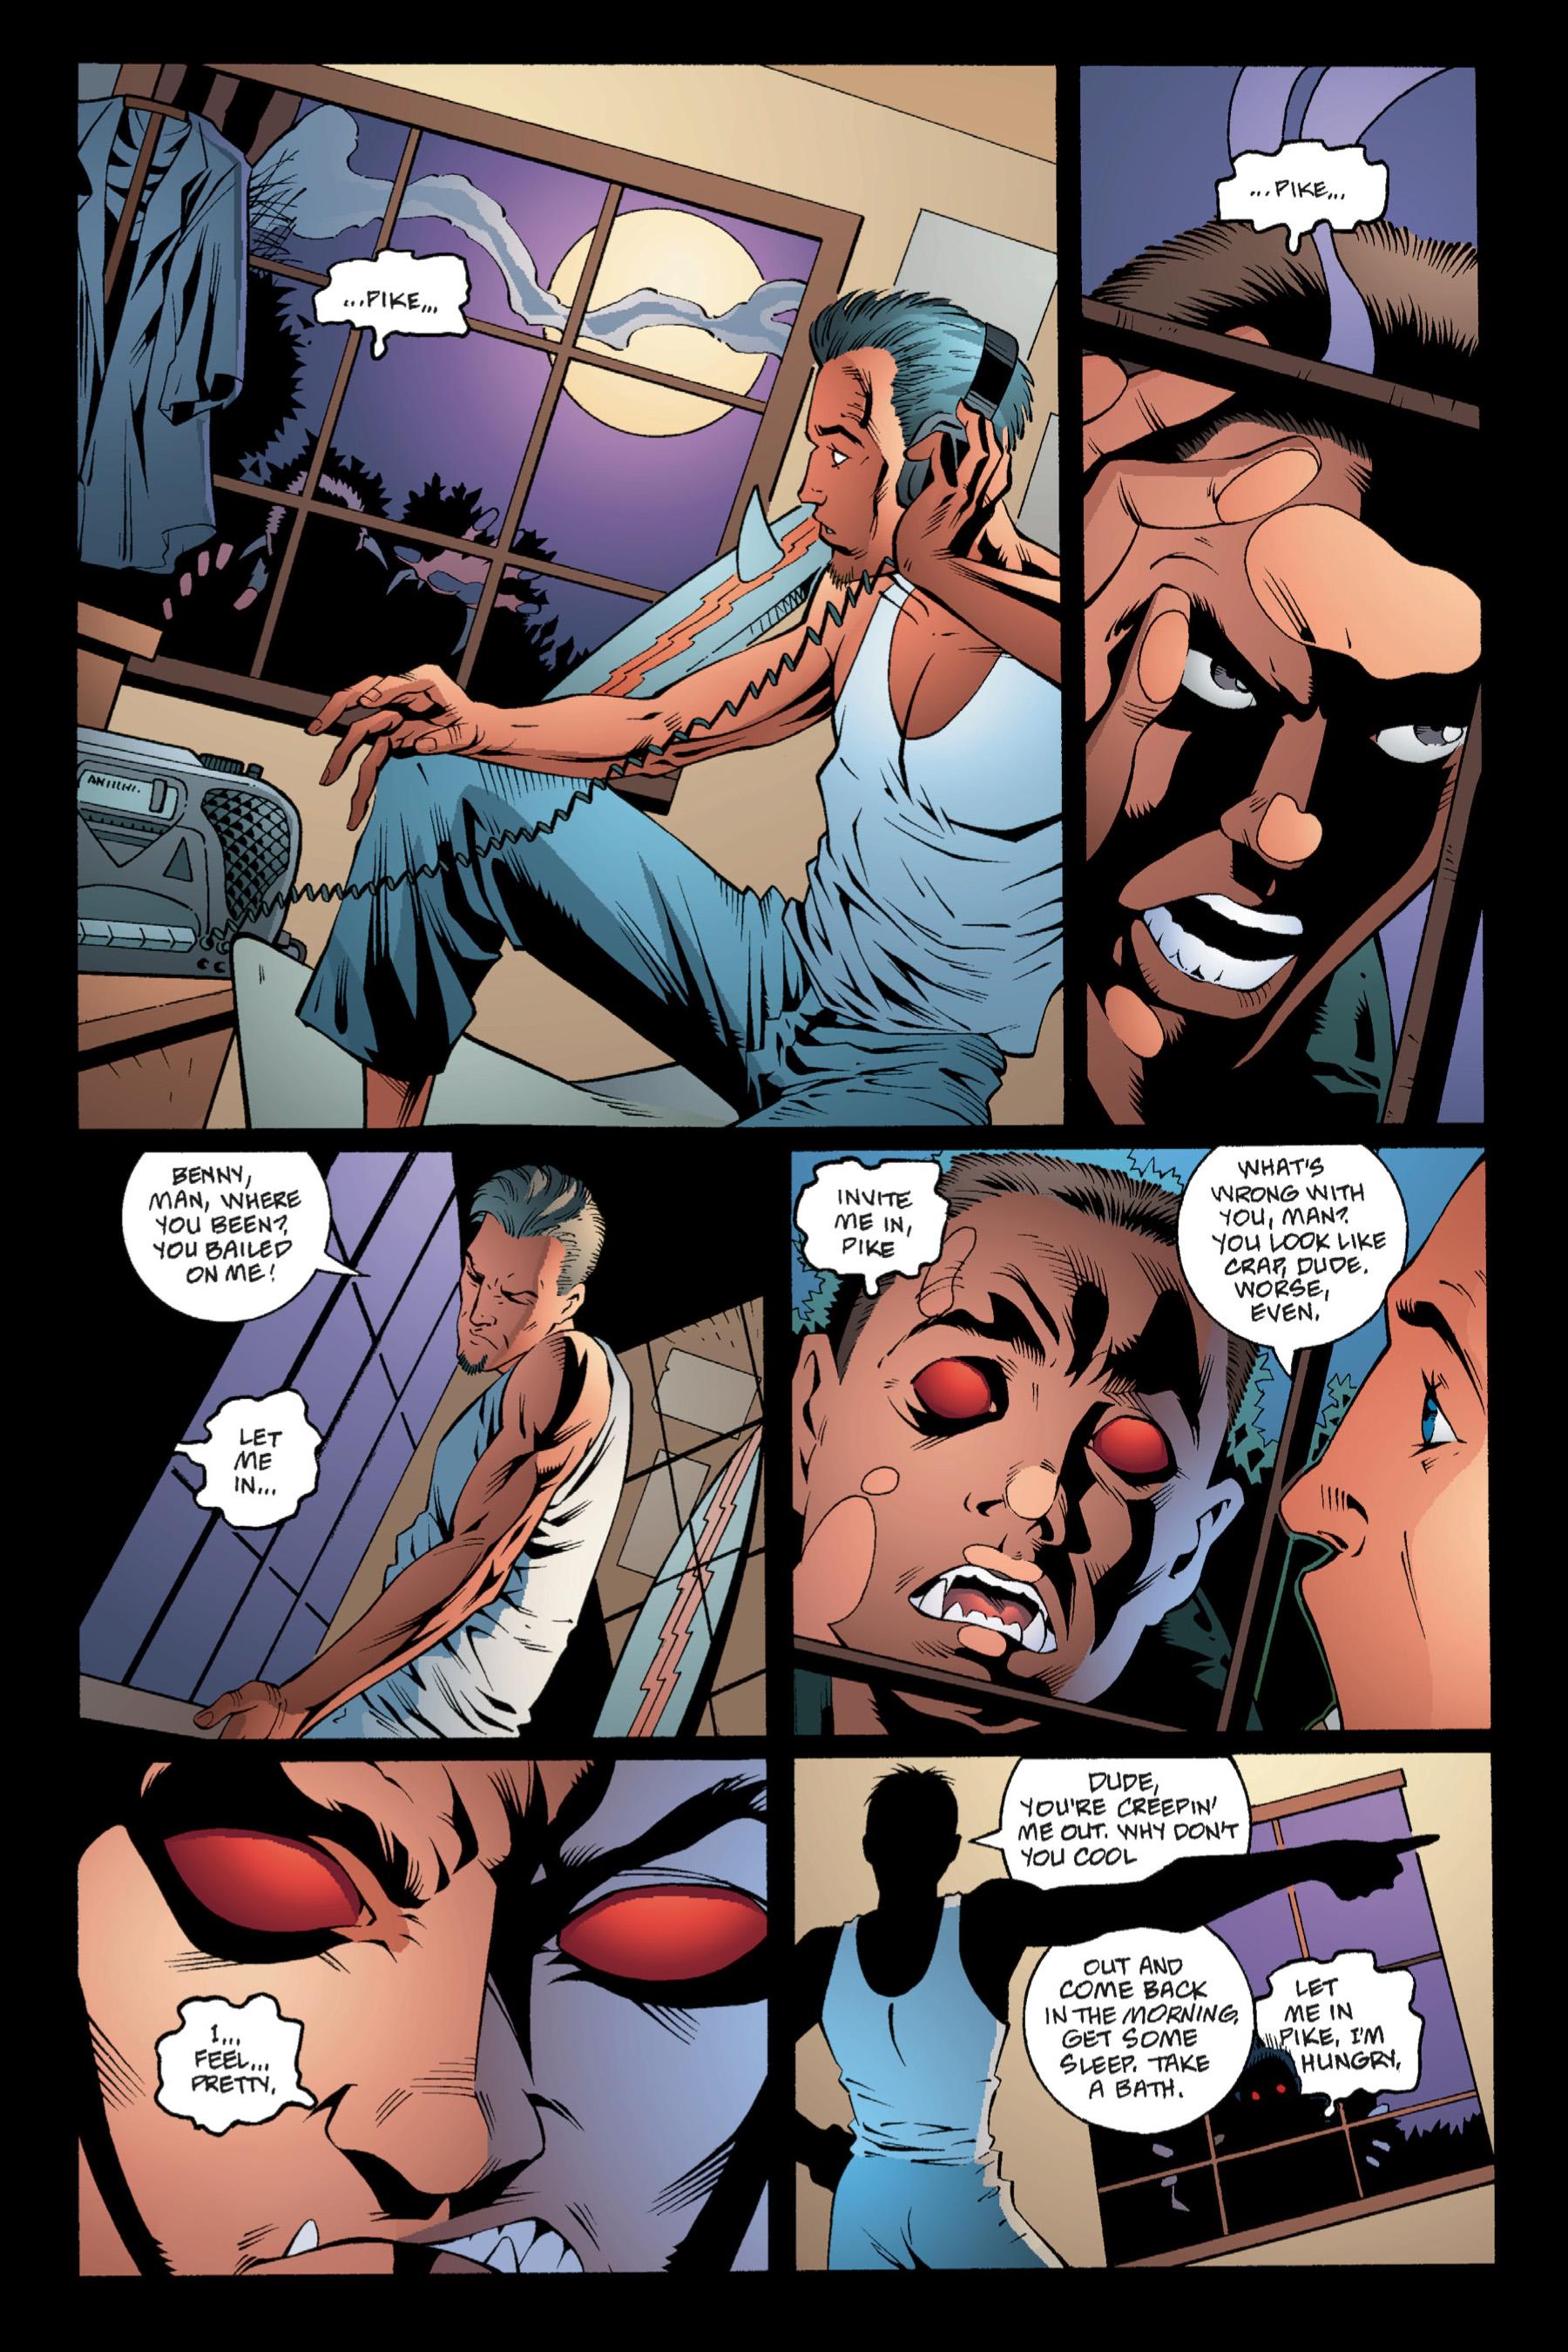 Read online Buffy the Vampire Slayer: Omnibus comic -  Issue # TPB 1 - 67